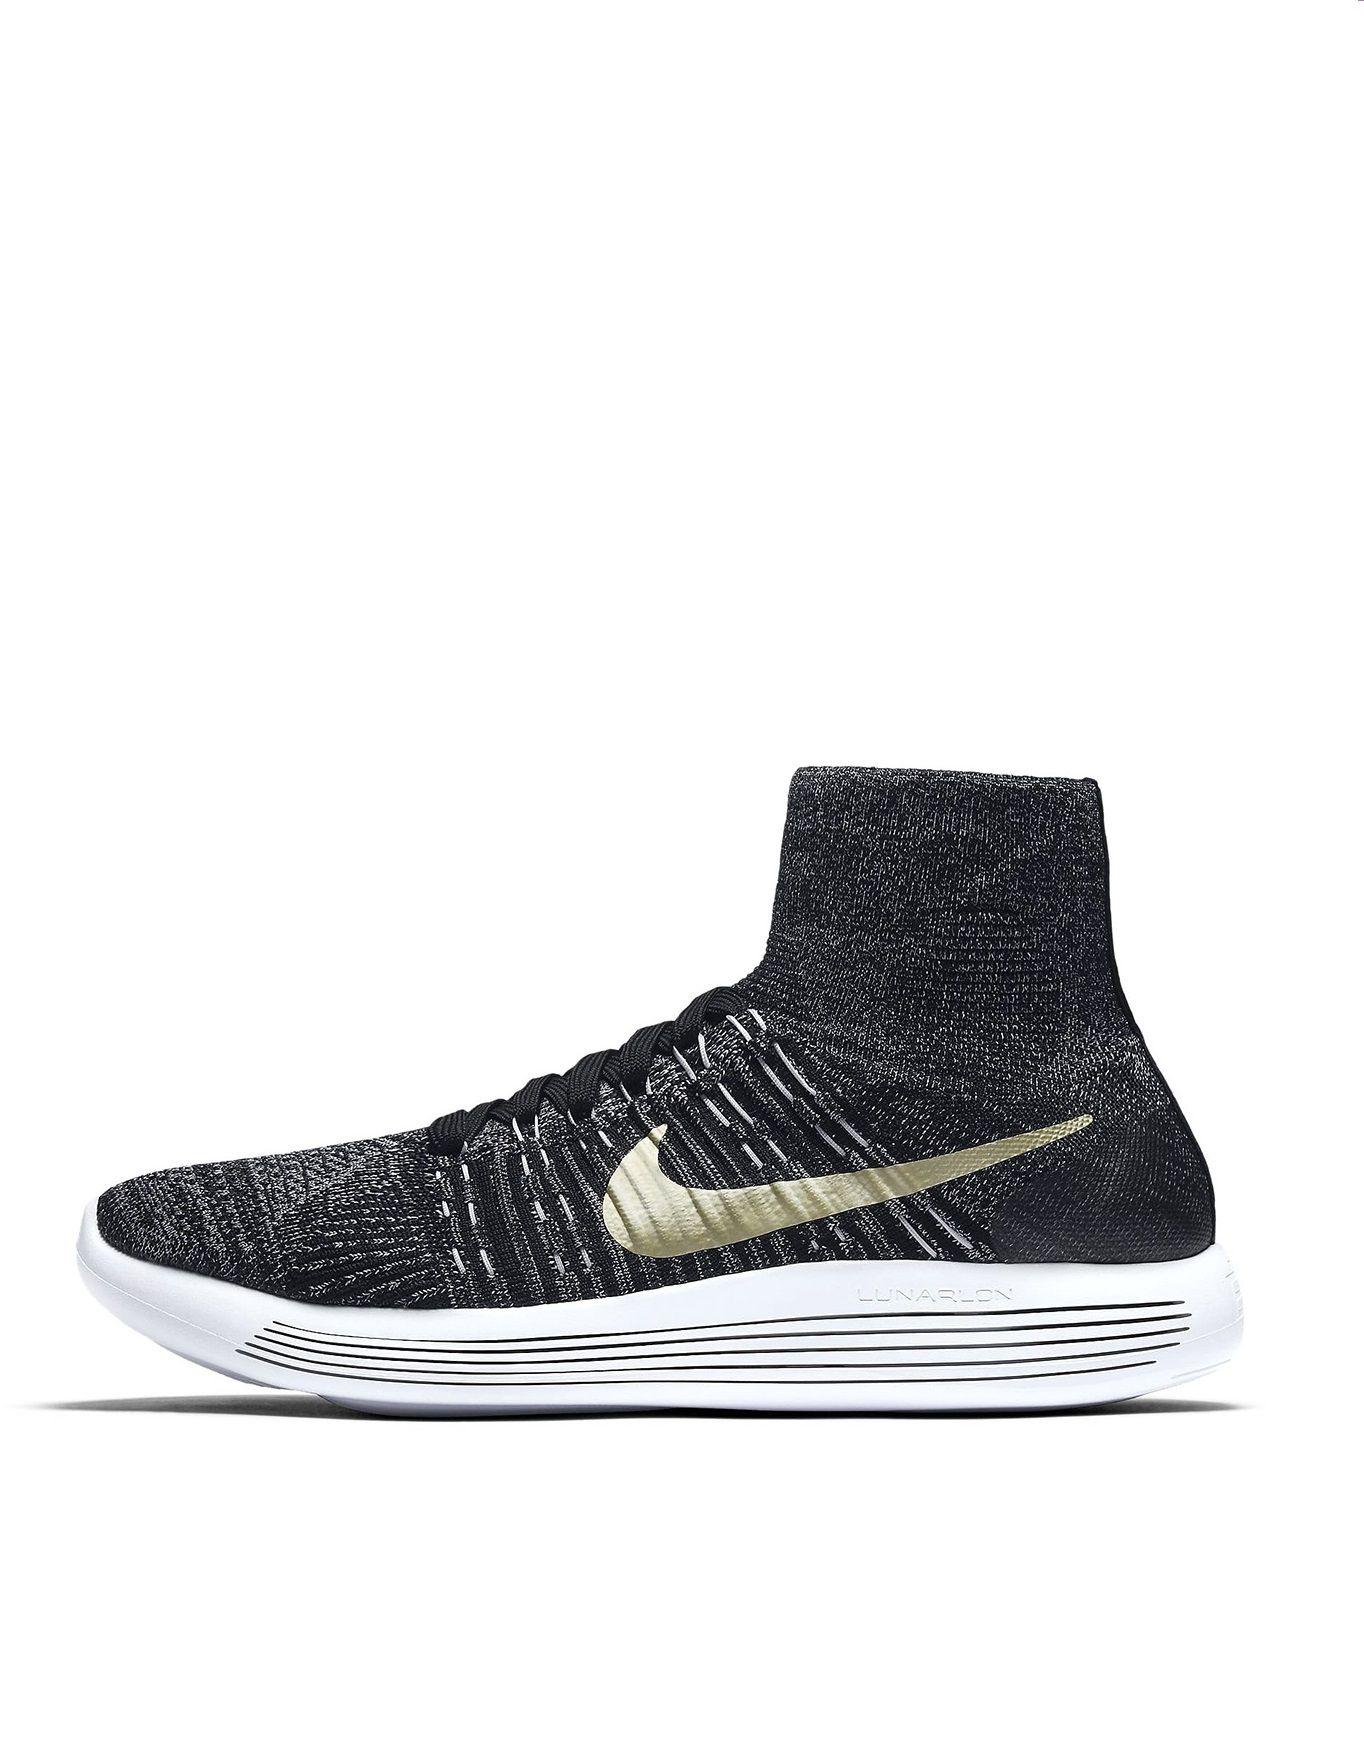 Nike Lunar Epic Flyknit \